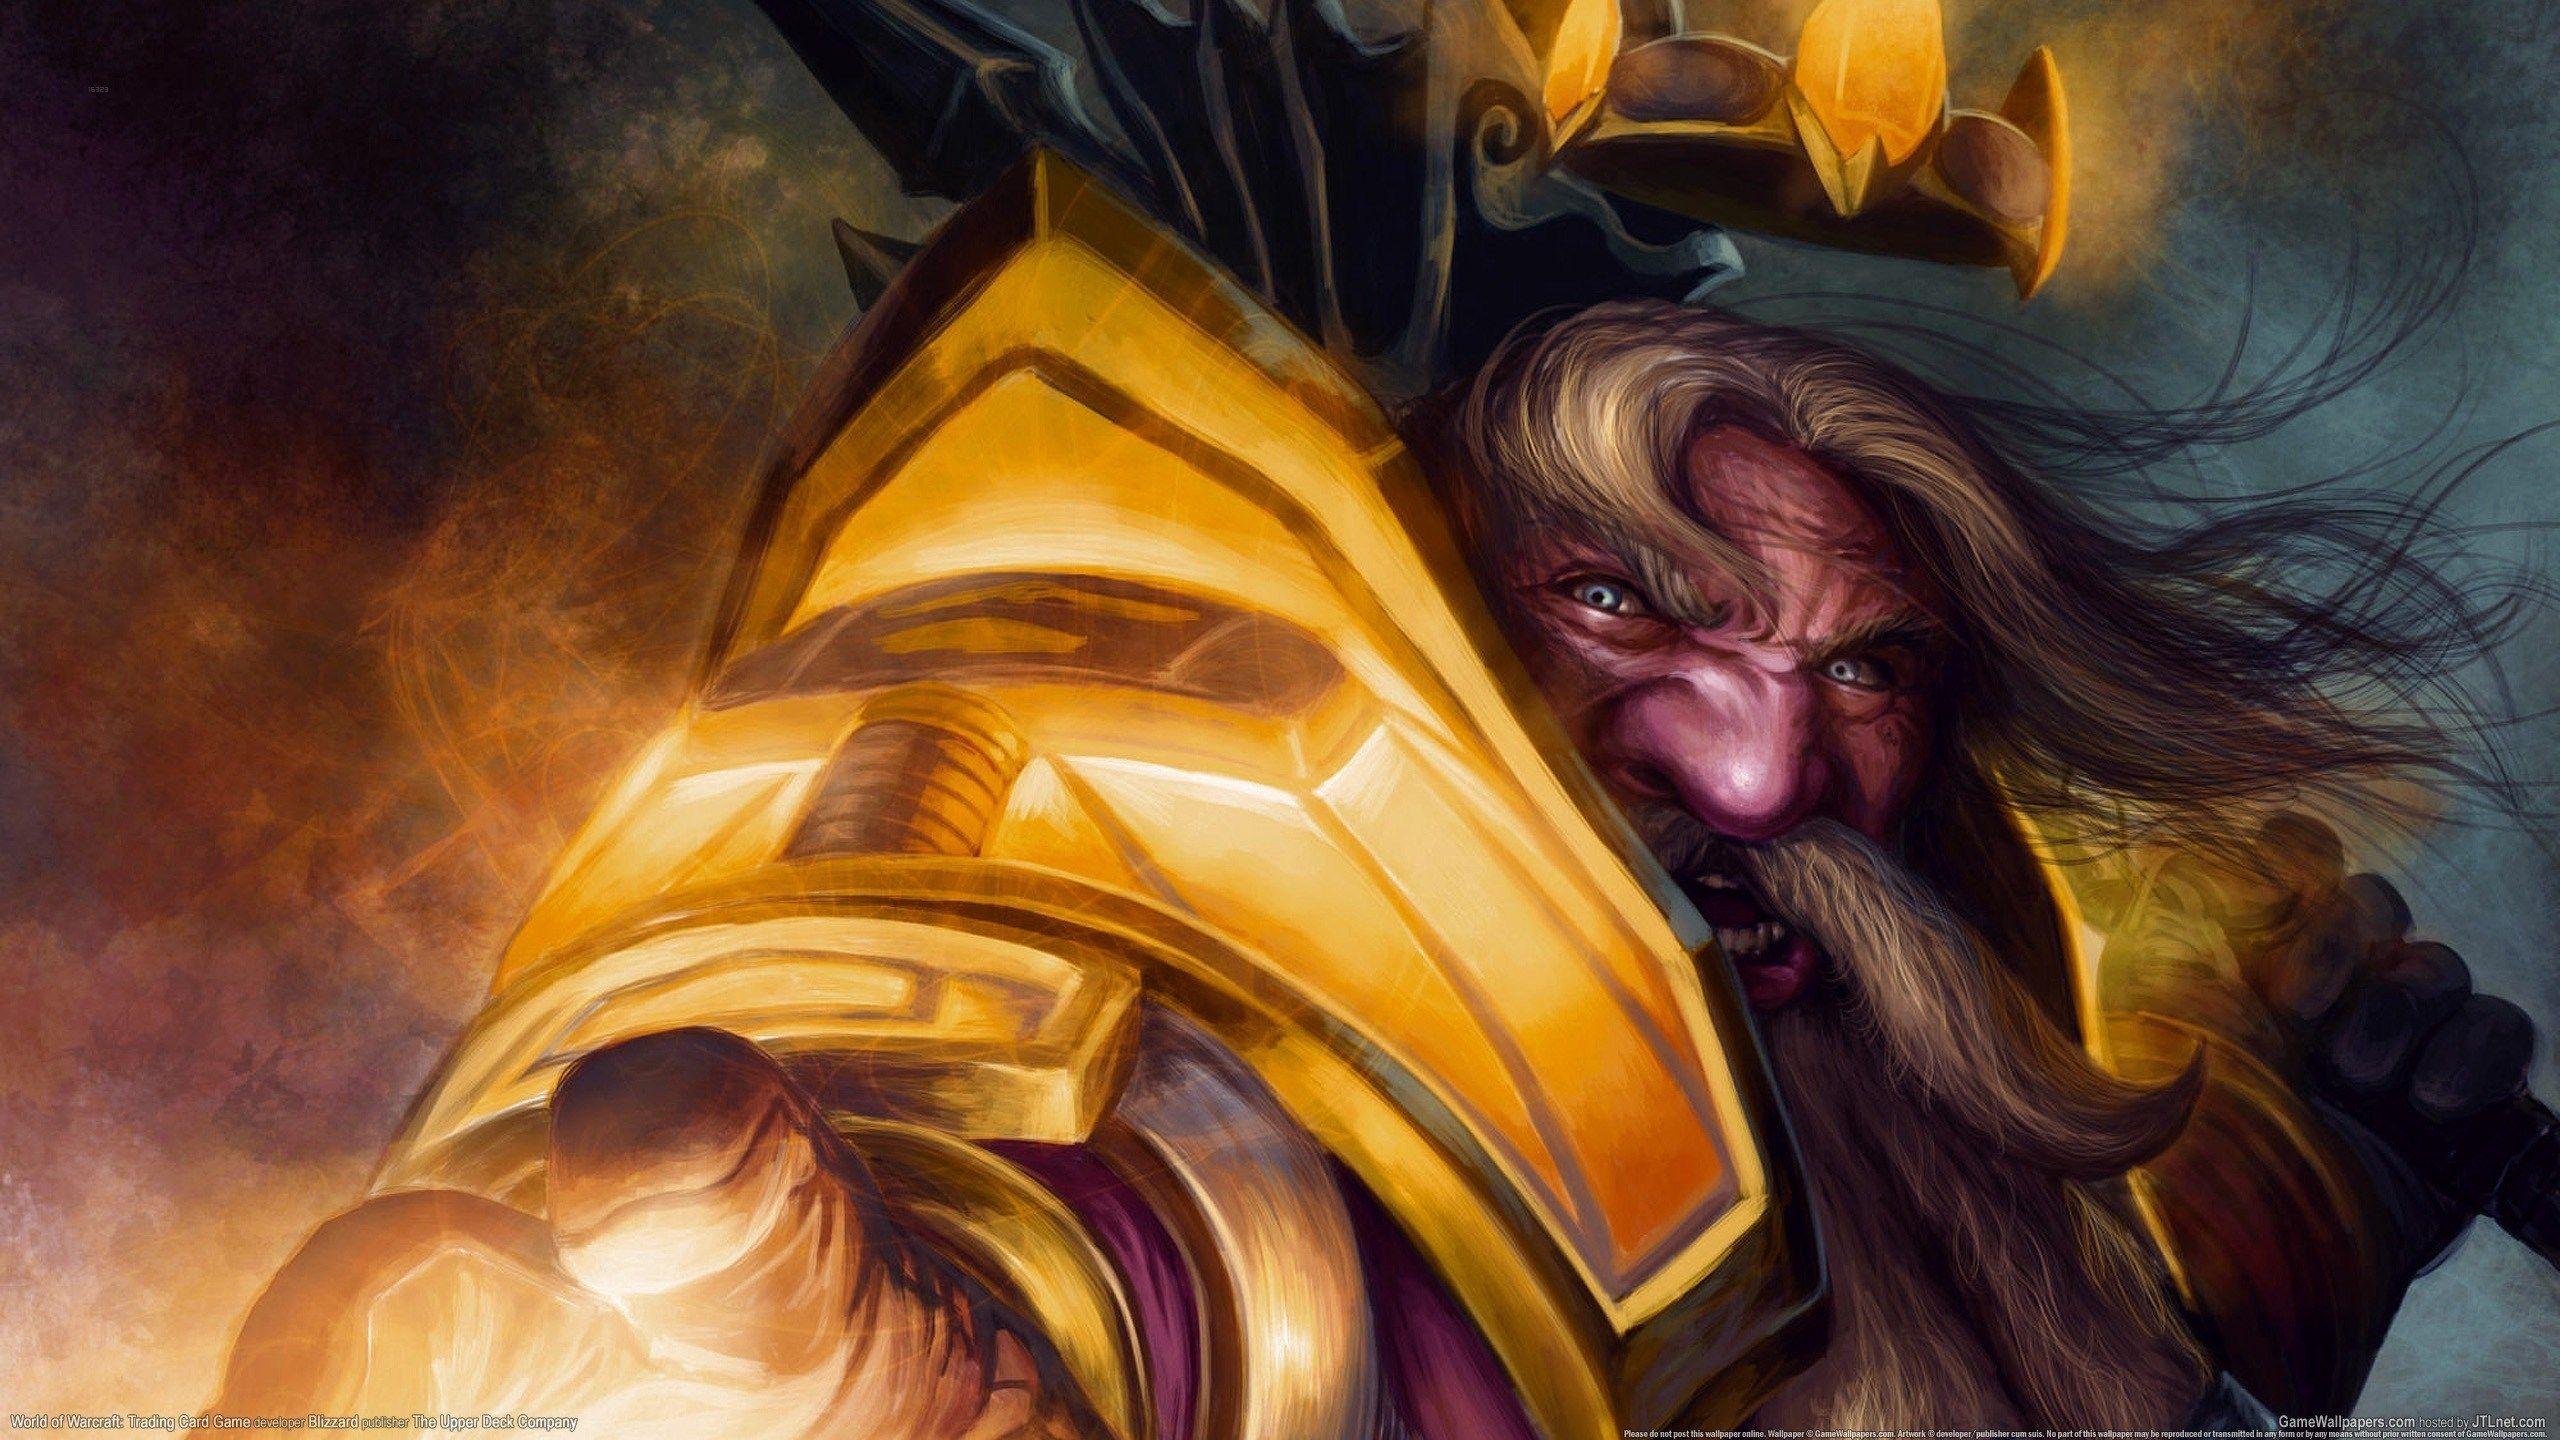 1710827 Hd Wallpaper World Of Warcraft World Of Warcraft Wallpaper World Of Warcraft Digital Wallpaper